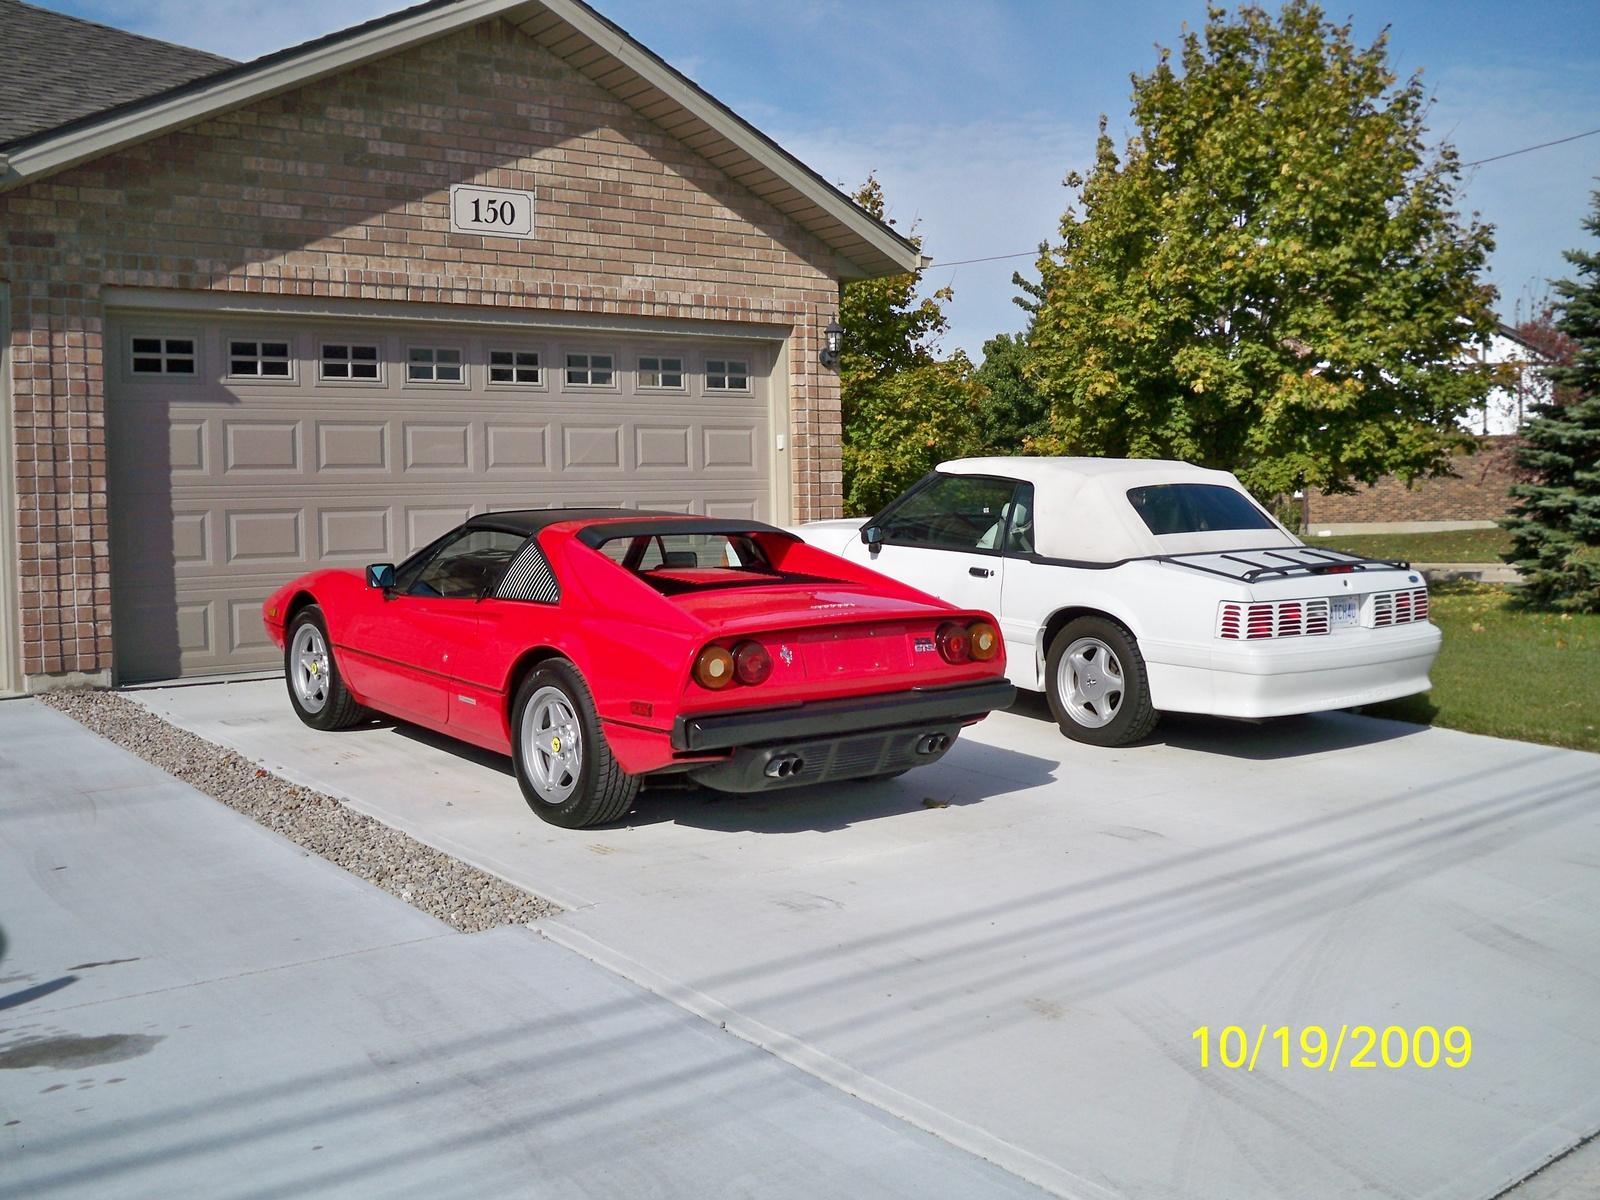 1982_ferrari_308_gtb-pic-640269868386939302 Fabulous Ferrari Mondial 8 Super Elite Cars Trend